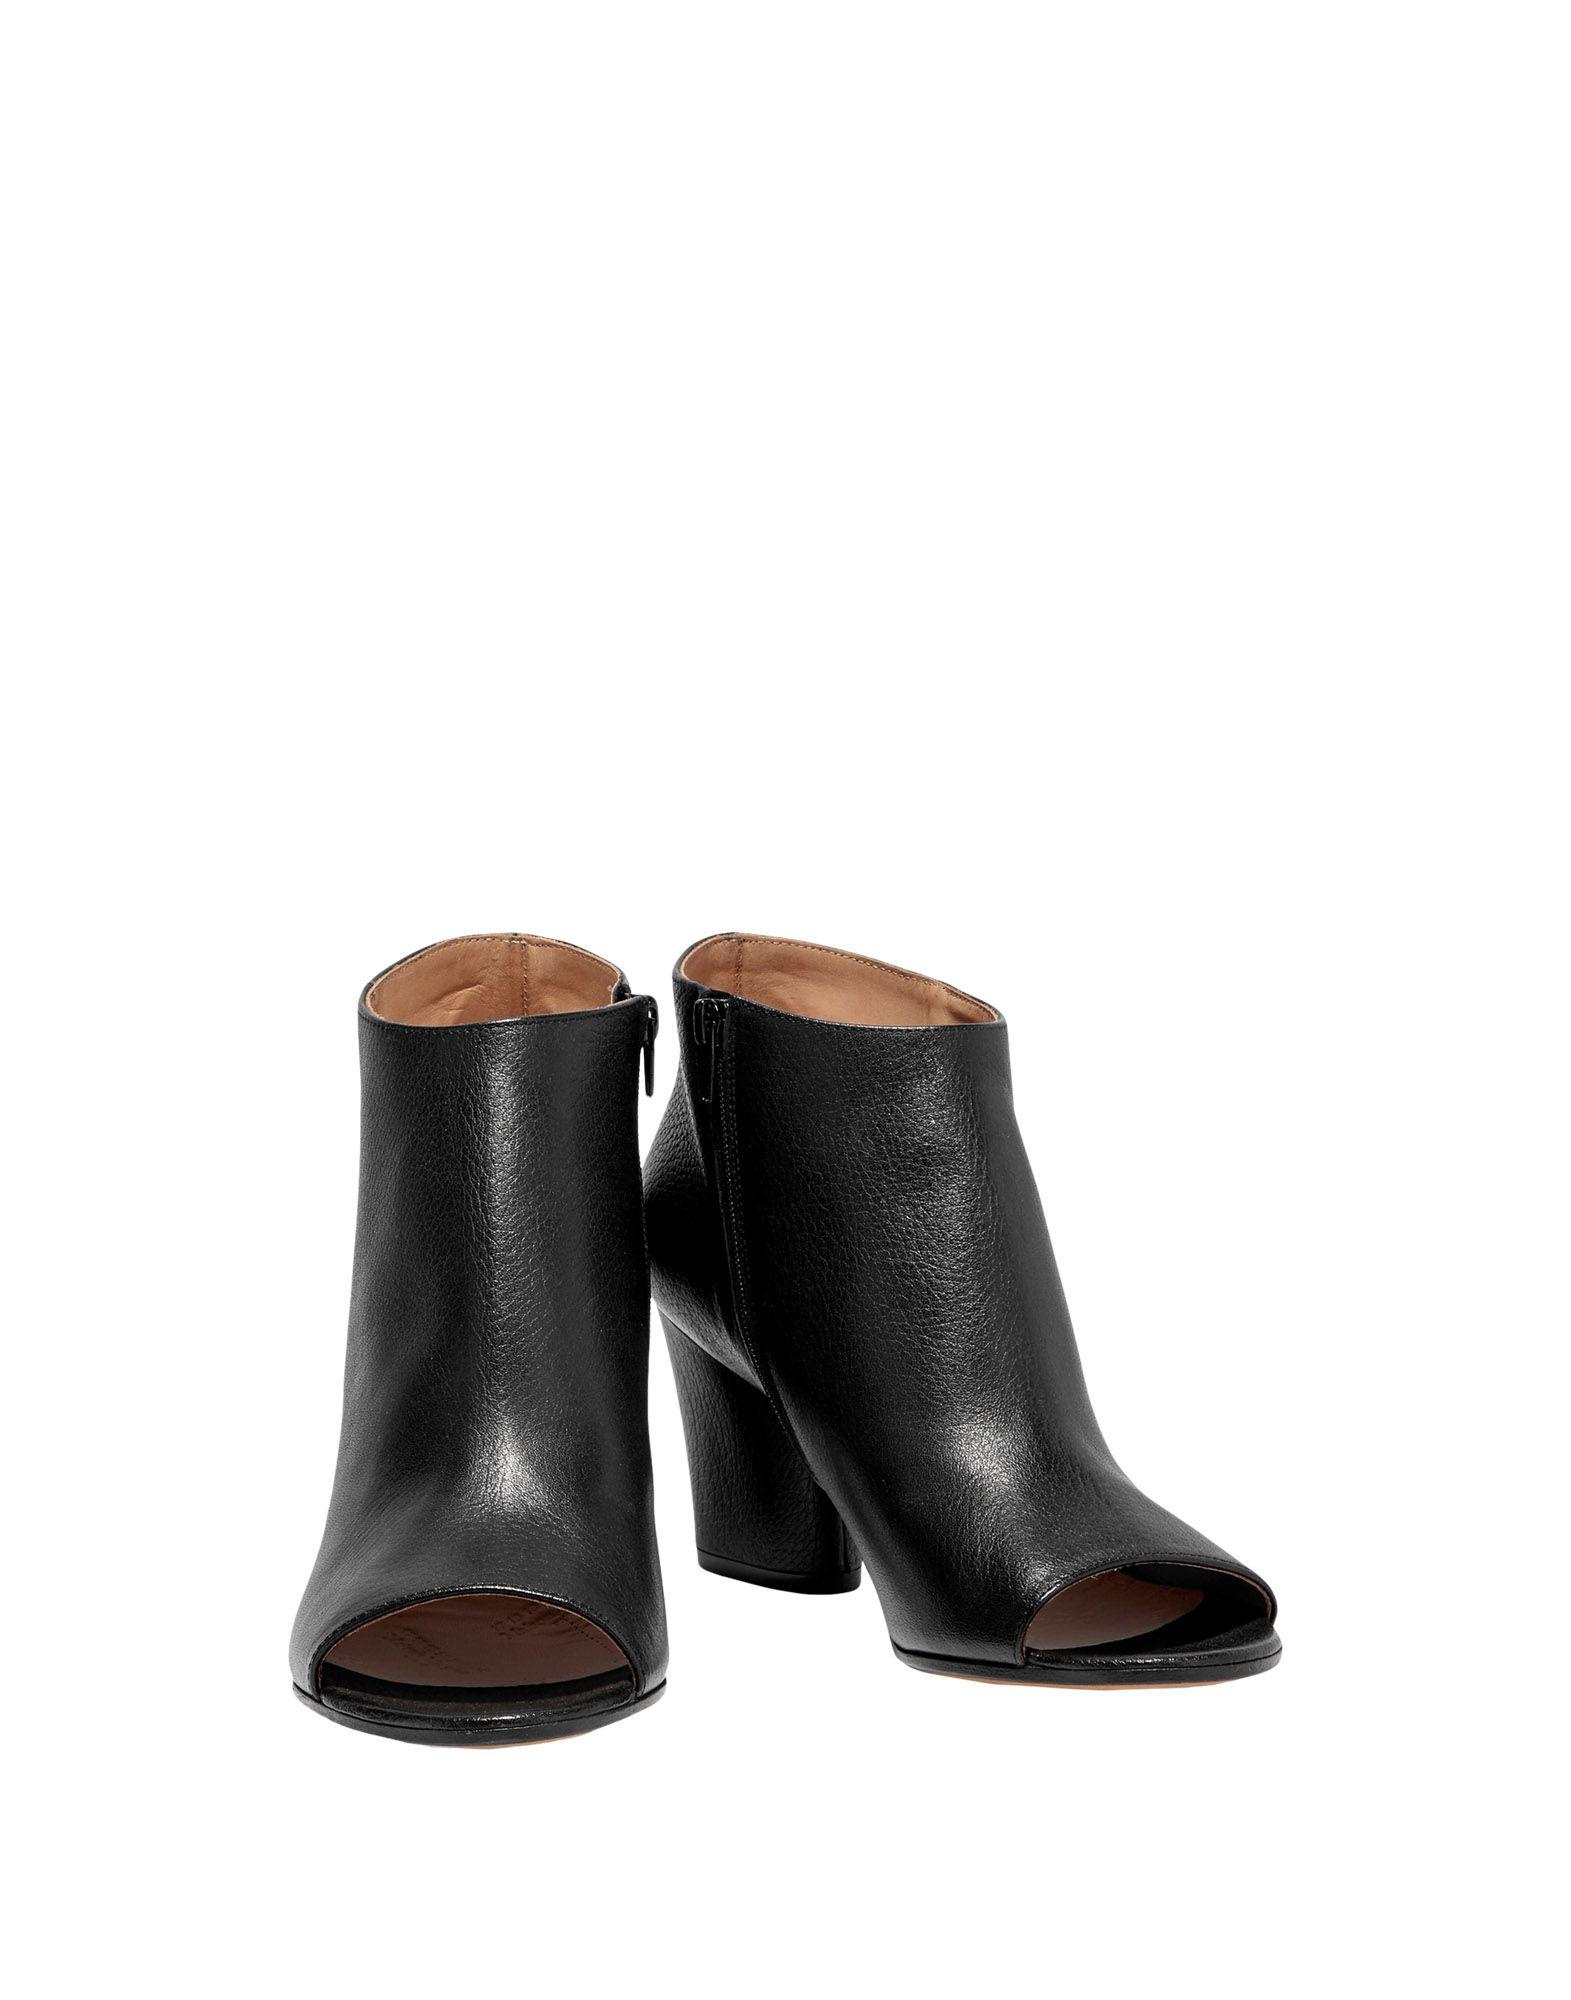 Maison Margiela Stiefelette Damen  11515084WQ Neue Schuhe